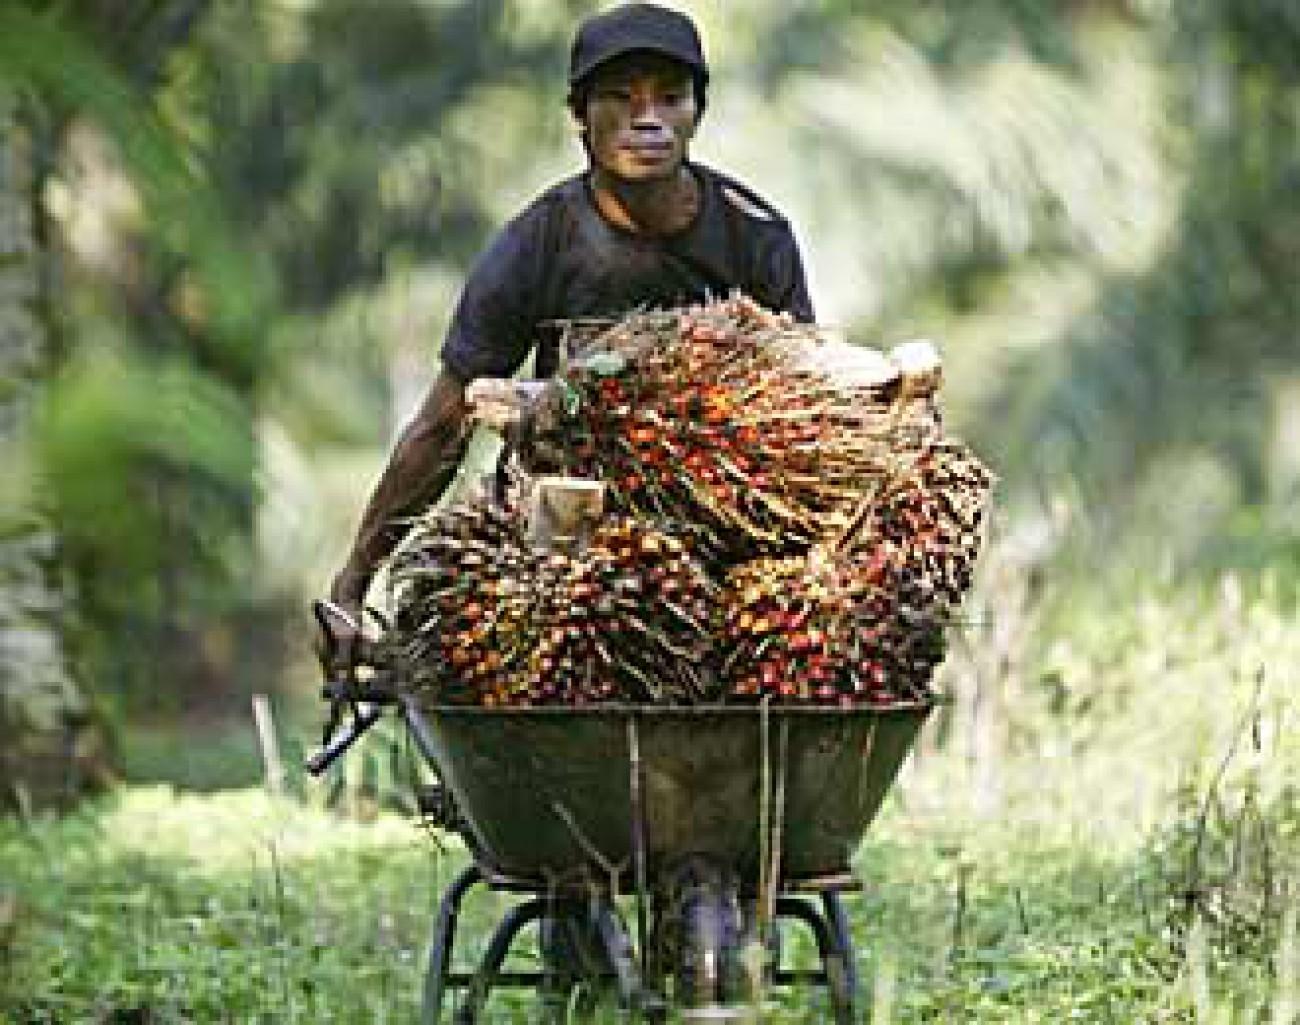 Petani Harus Kuasai 30% Perusahaan Pengolah Sawit